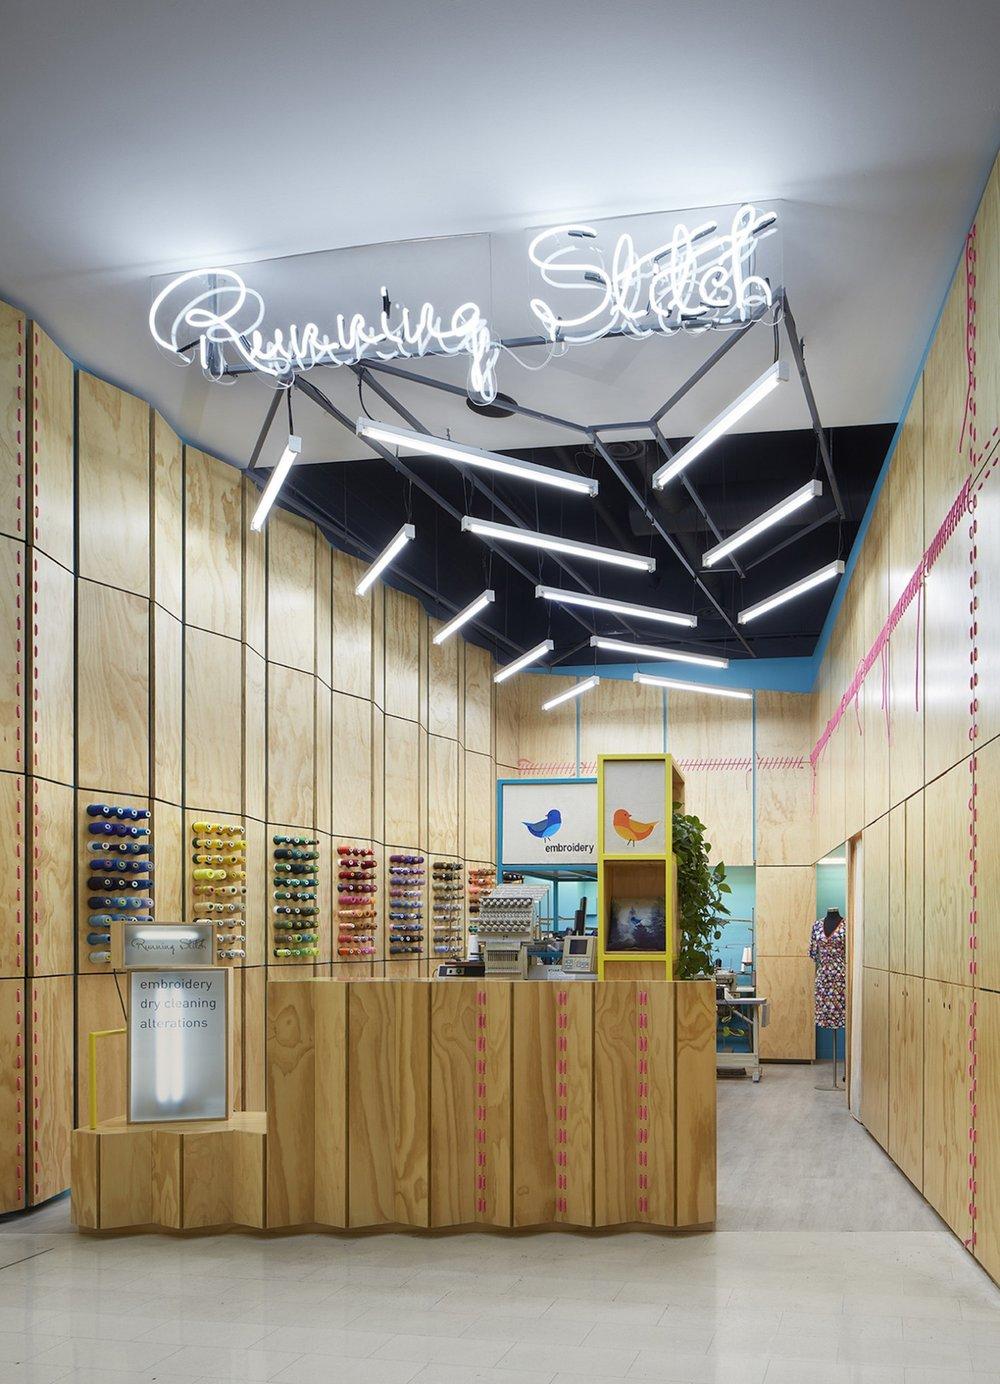 Pinto-Tuncer-Retail-Running-Stitch-01.jpg